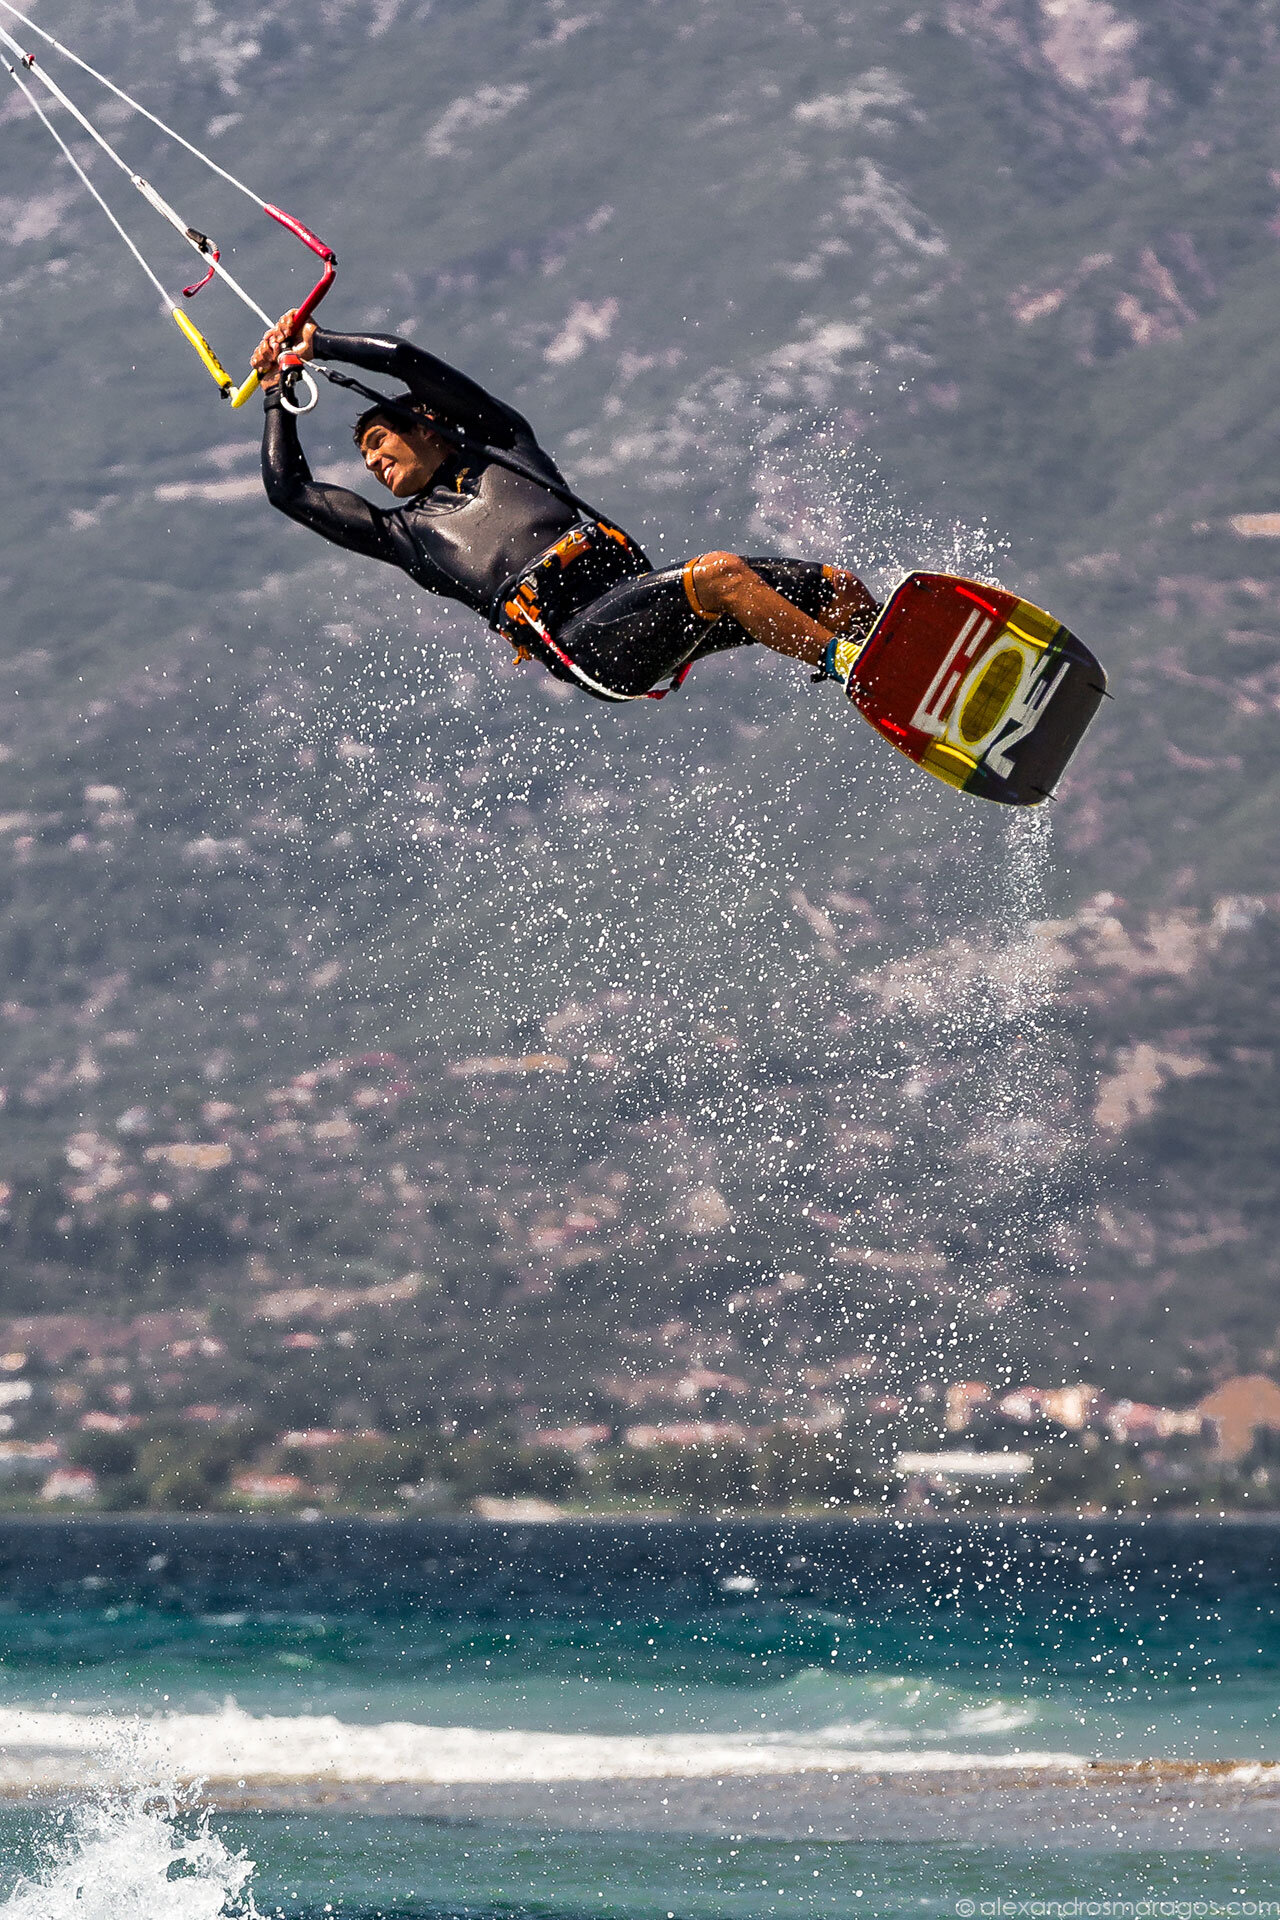 alexandros-maragos-sports-photography-kiteboarding-1.jpg